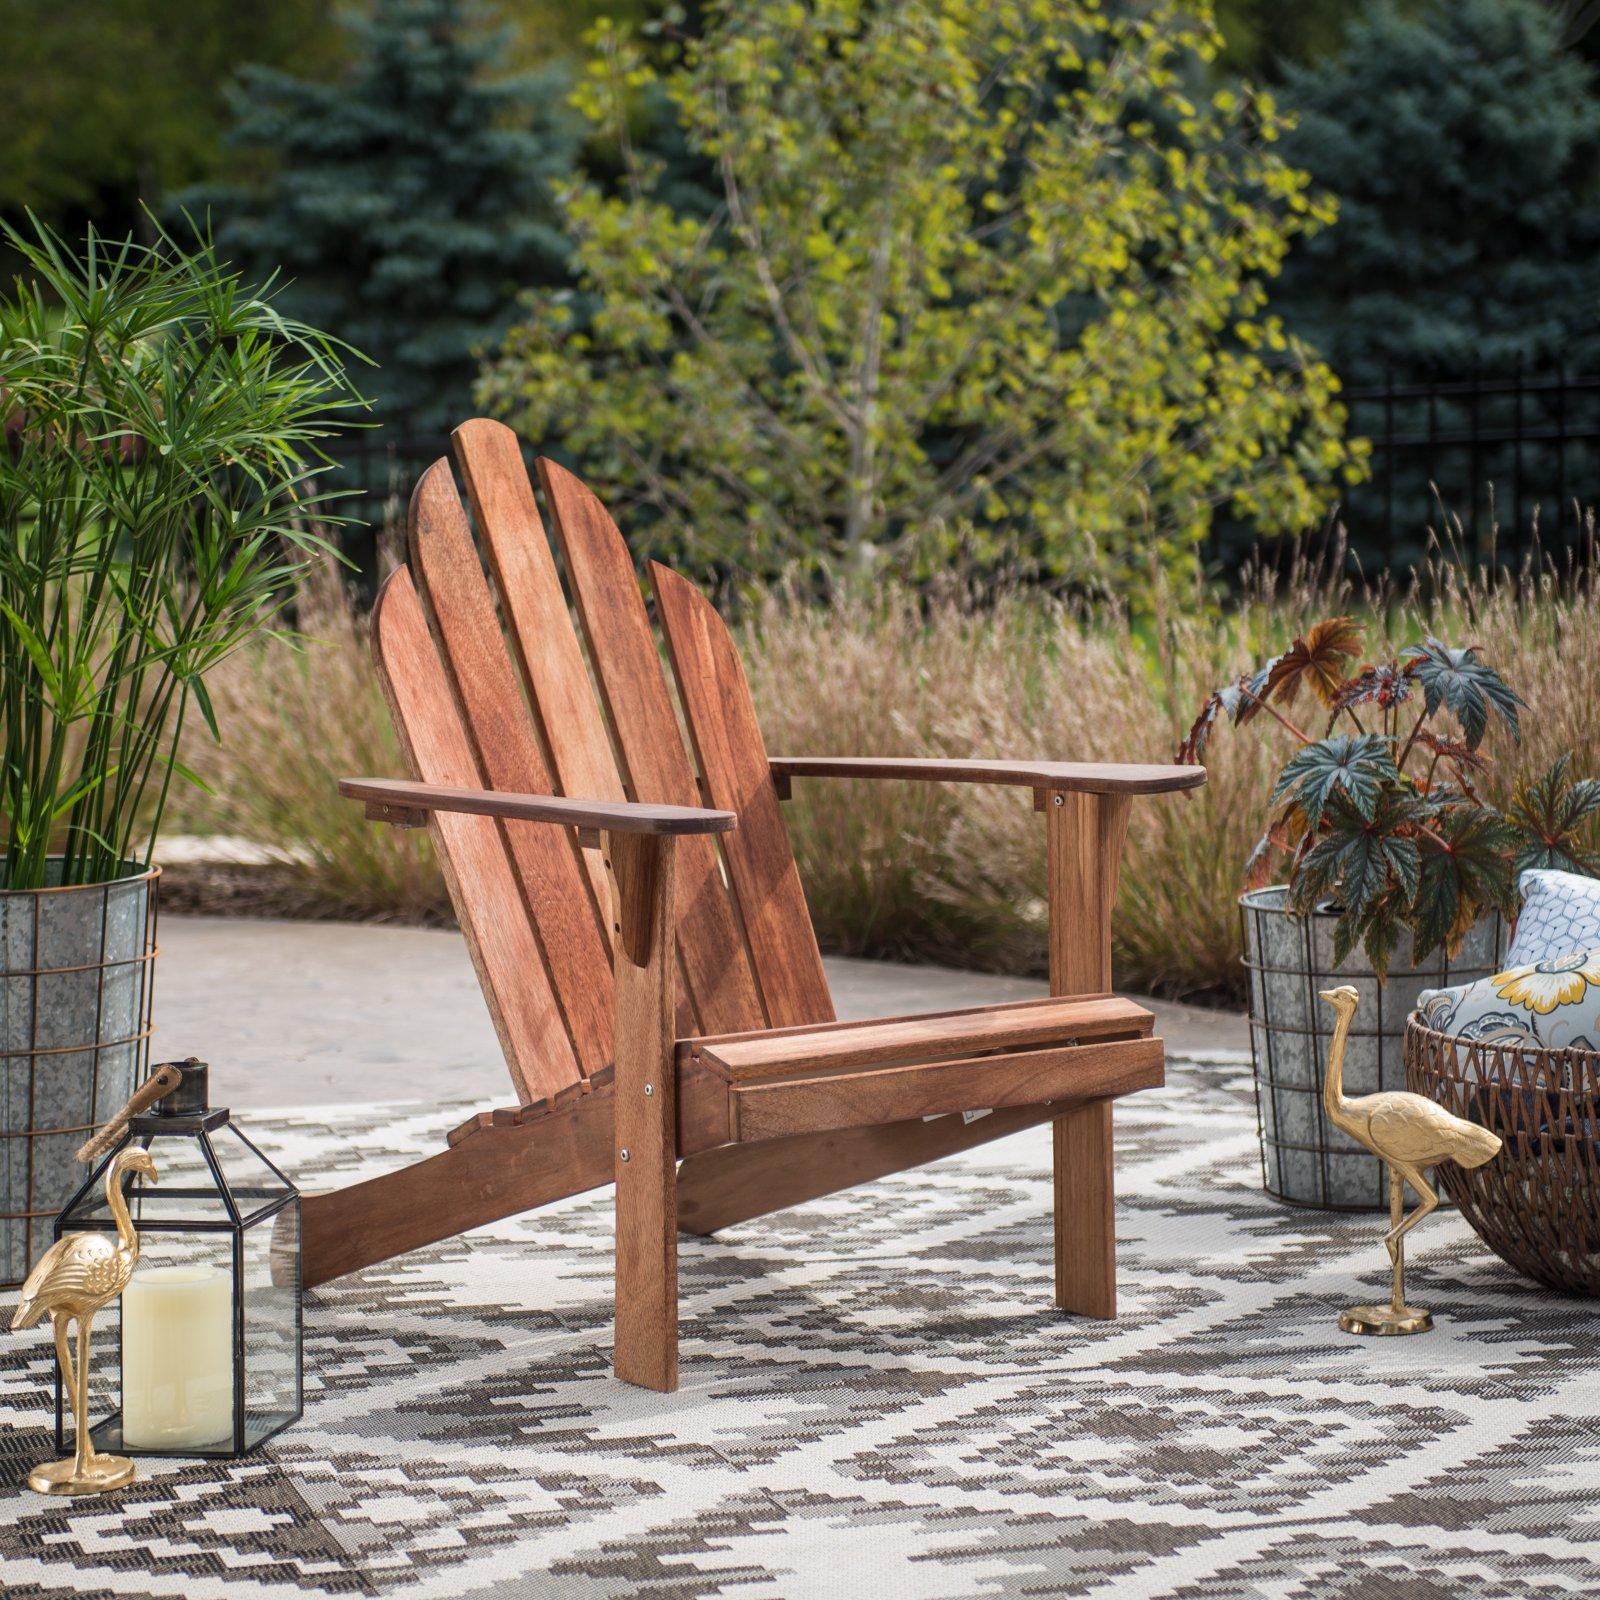 Belham Living Pearson Adirondack Chair